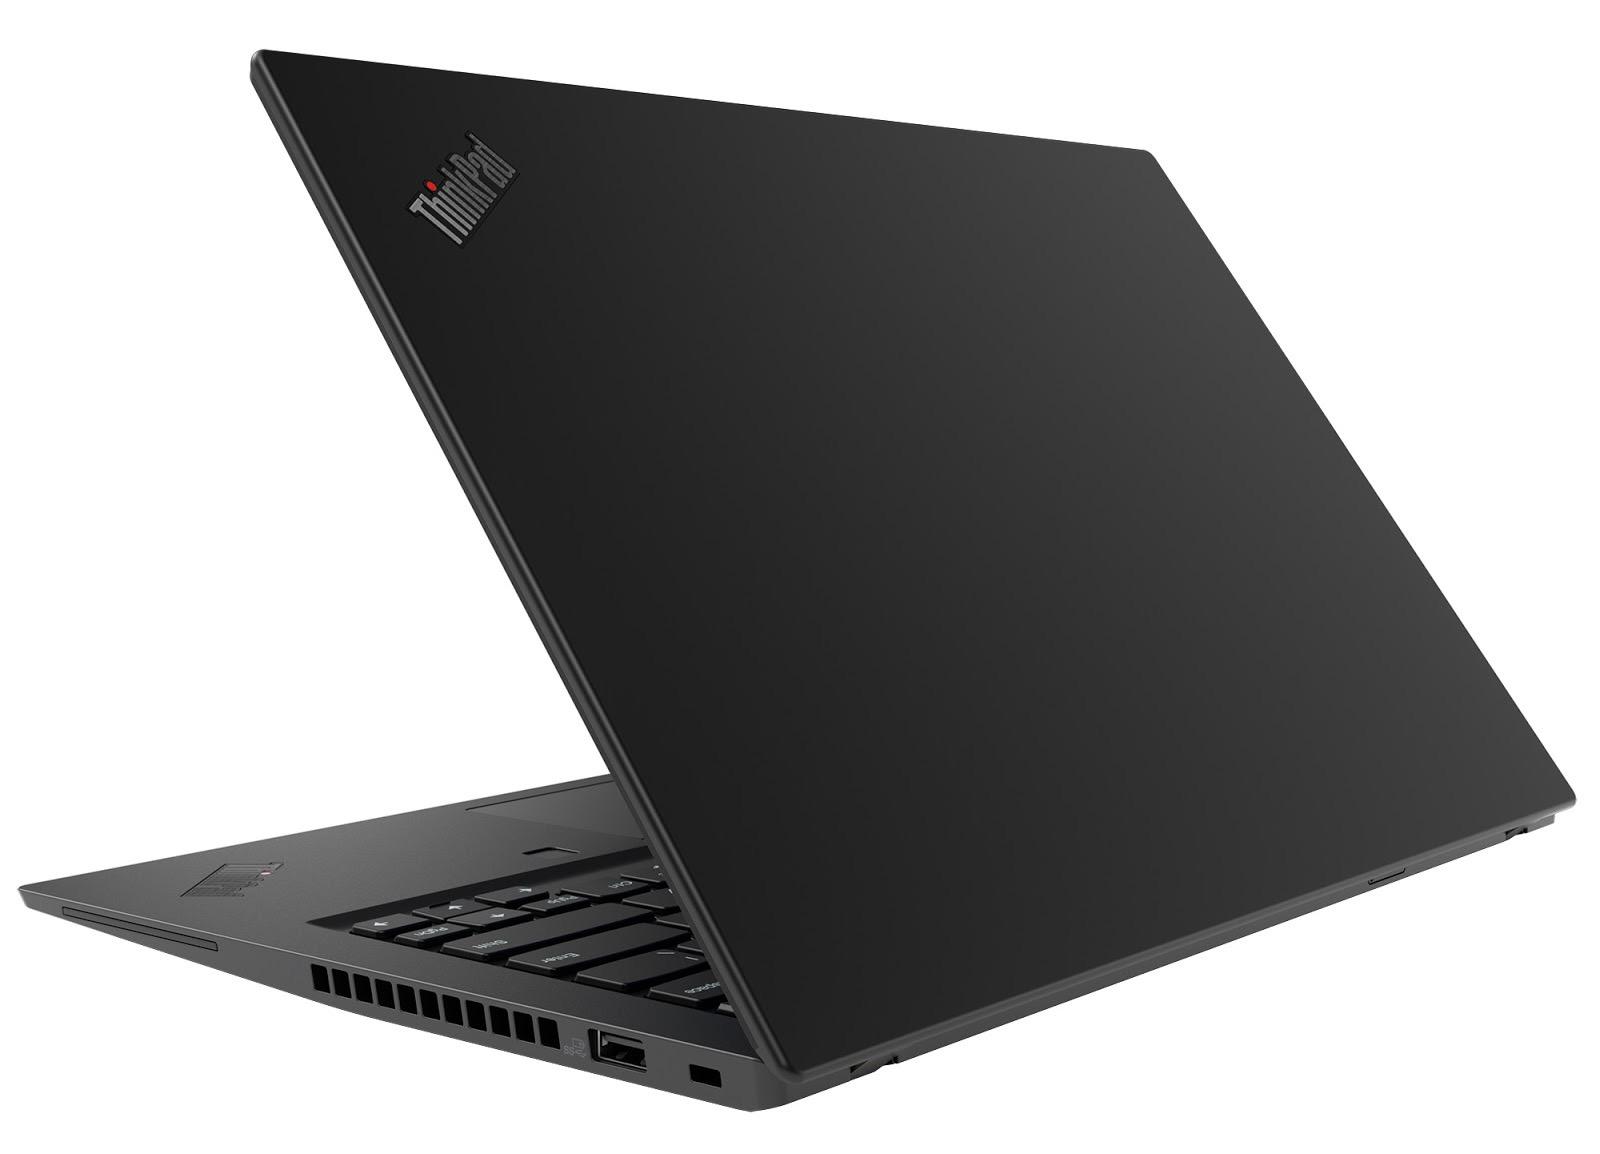 Фото 23. Ноутбук Lenovo ThinkPad T14 Gen 1 Black (20S00004RT)